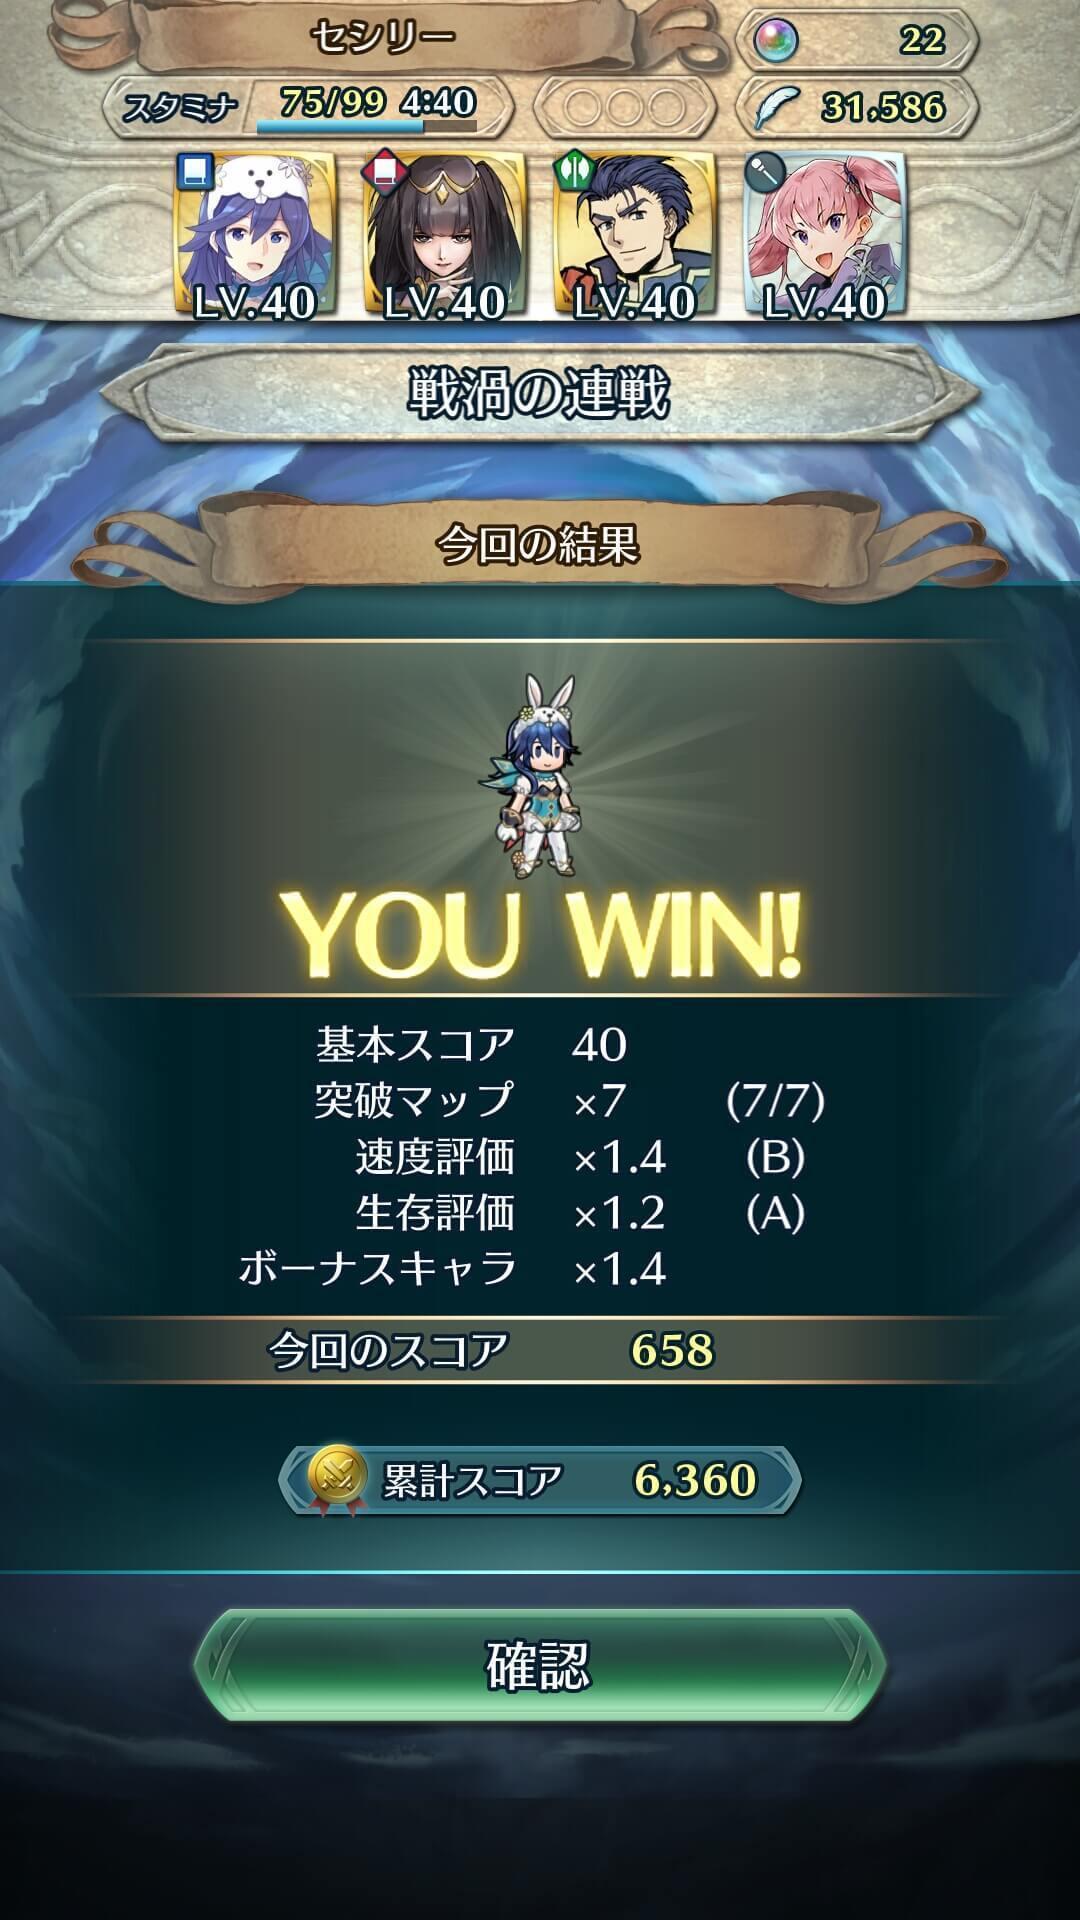 feh_09_02.jpg